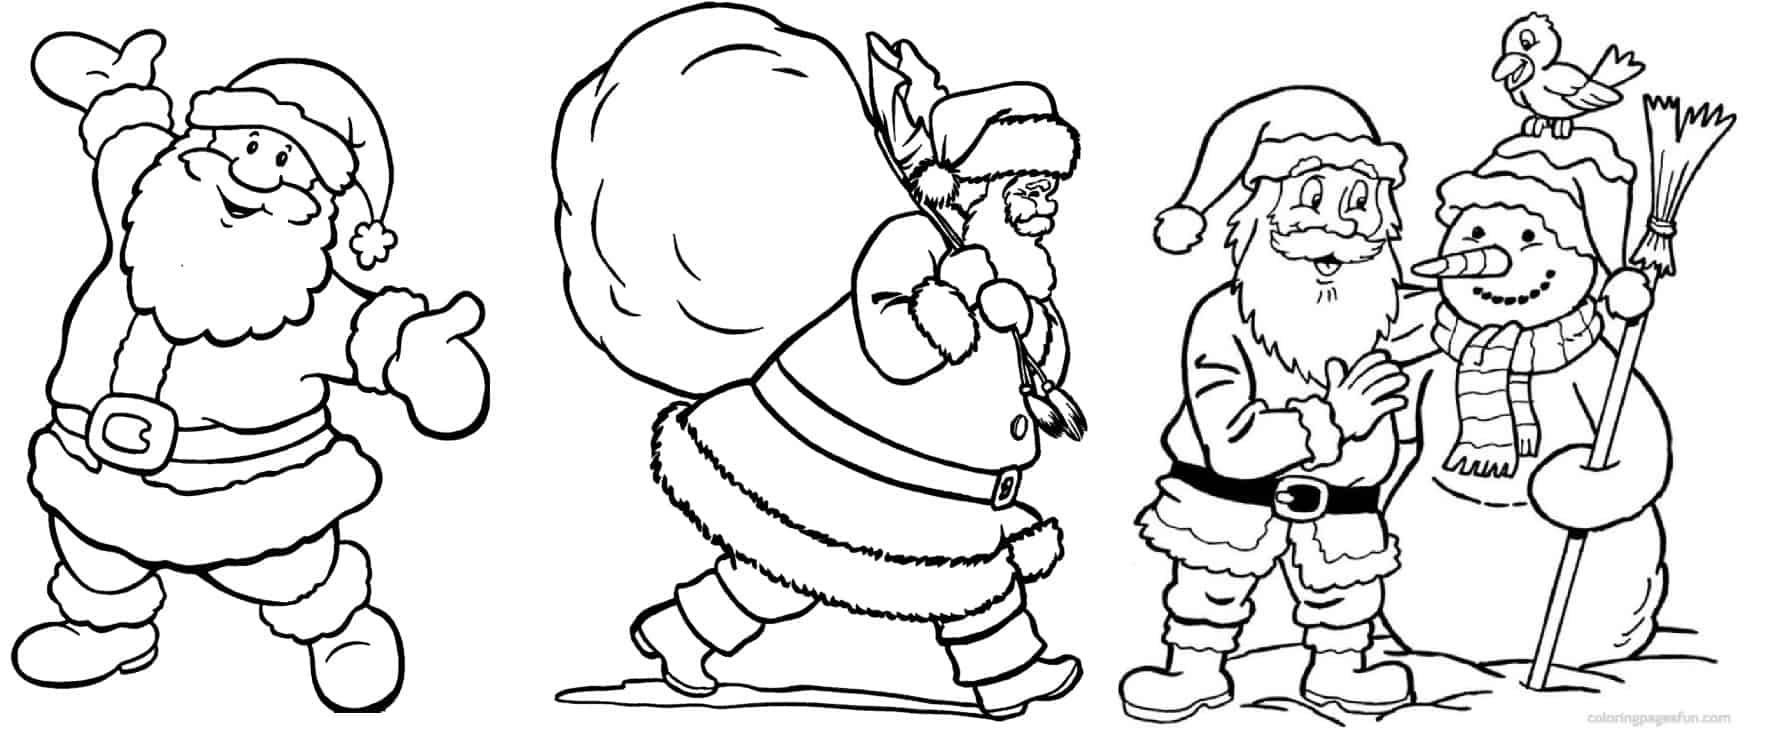 Desenhos De Natal Para Colorir: 135 Modelos Para Imprimir